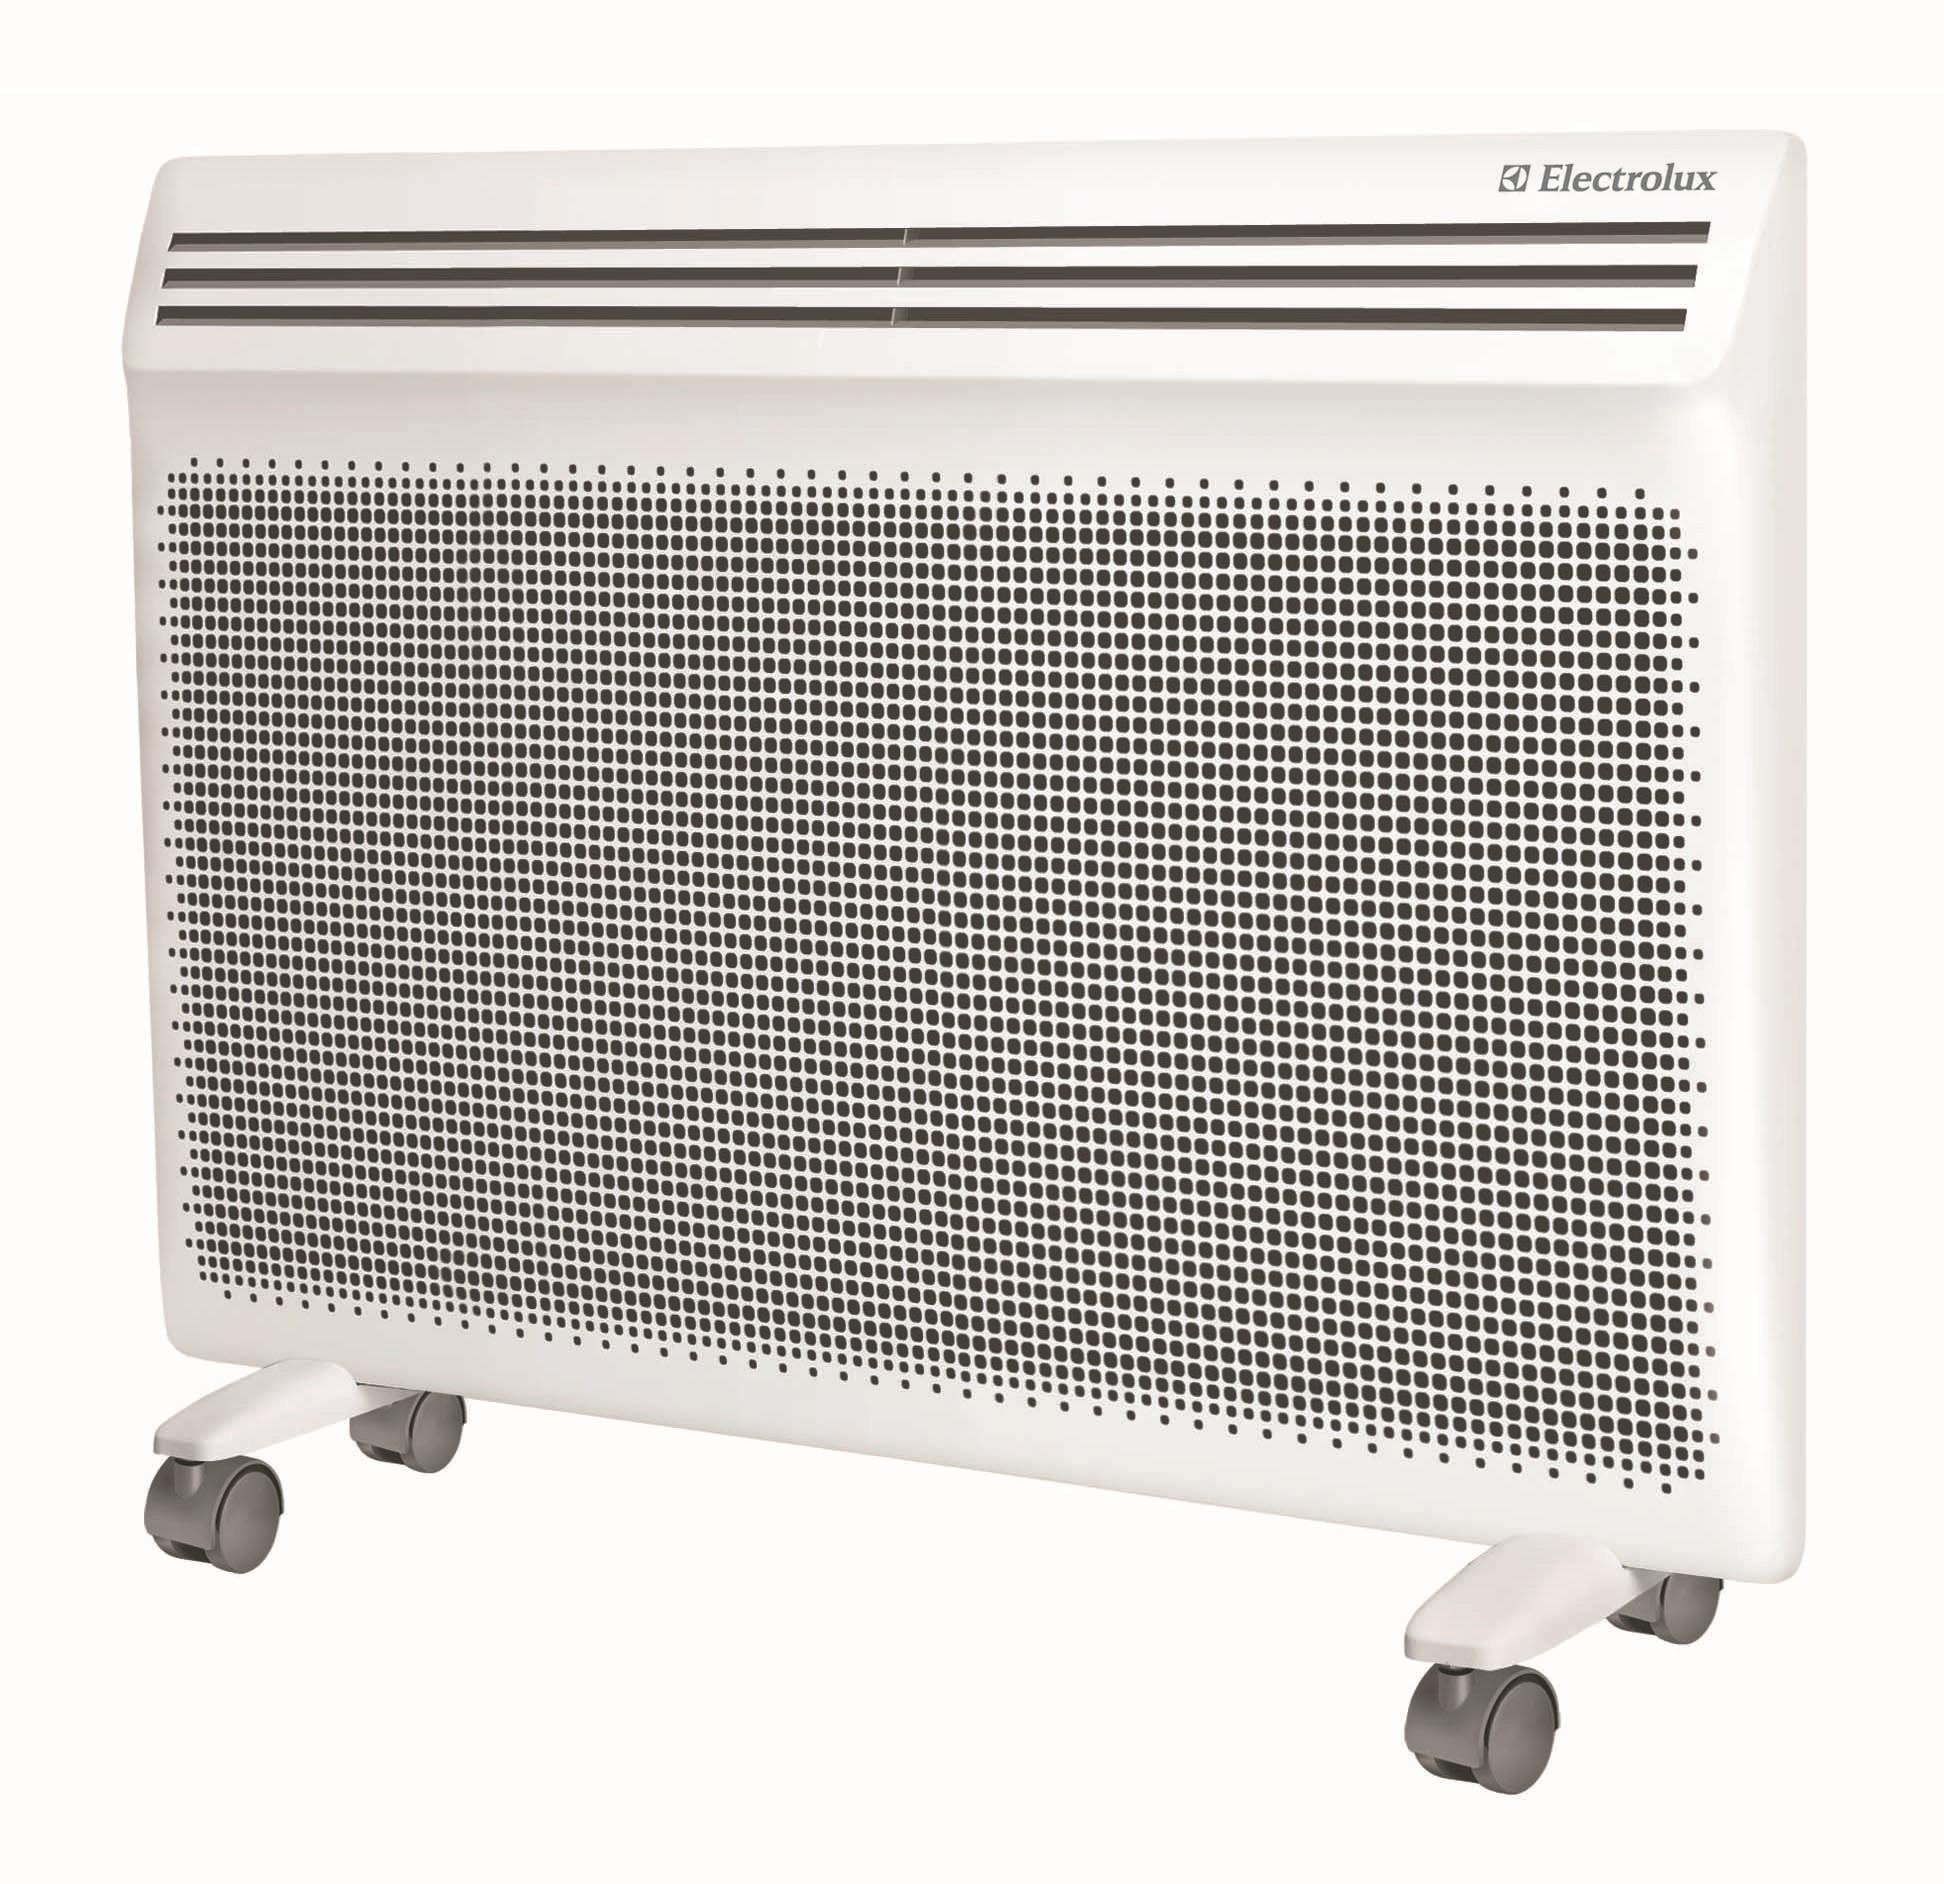 Конвектор Electrolux Eih/ag2 – 1500 e конвектор electrolux eih ag2 – 1500 e